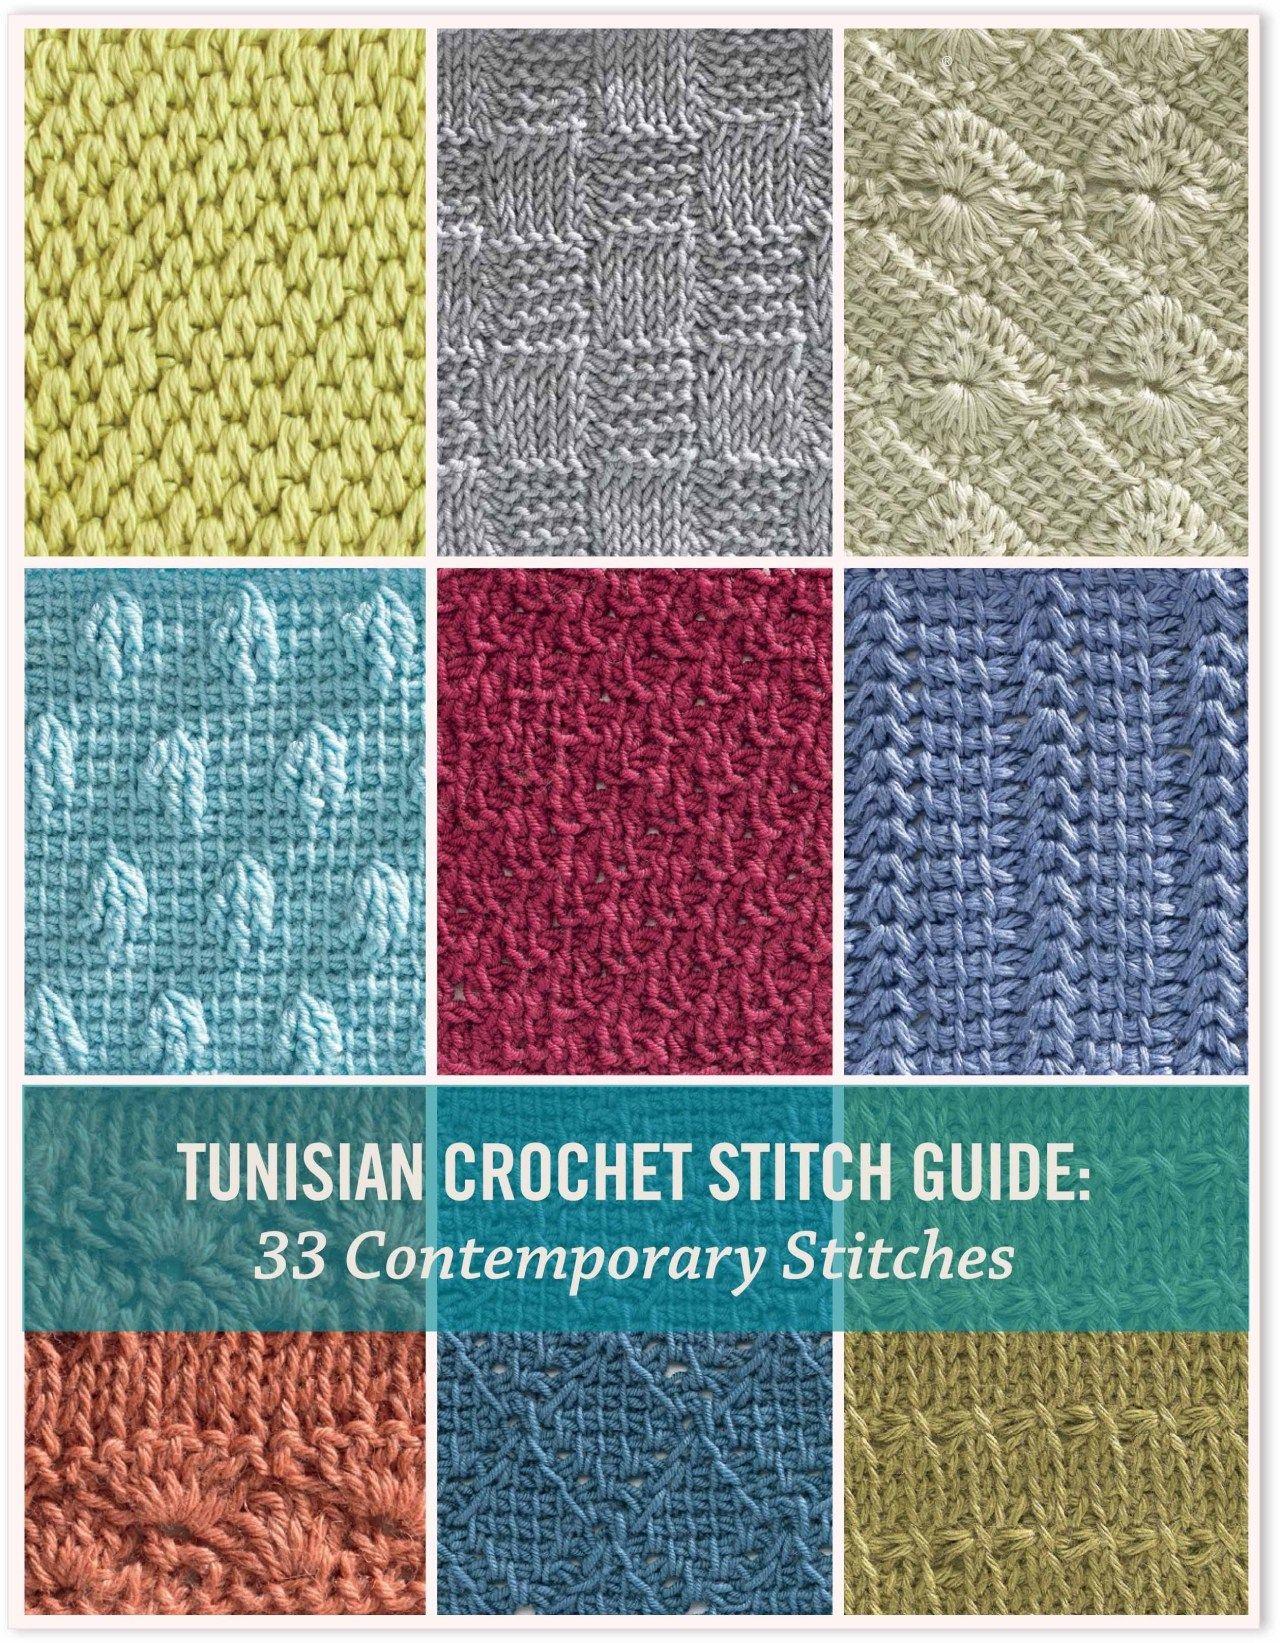 Tunisian Crochet Patterns Tunisian Crochet Patterns For Beginners Youtube #tunisiancrochet